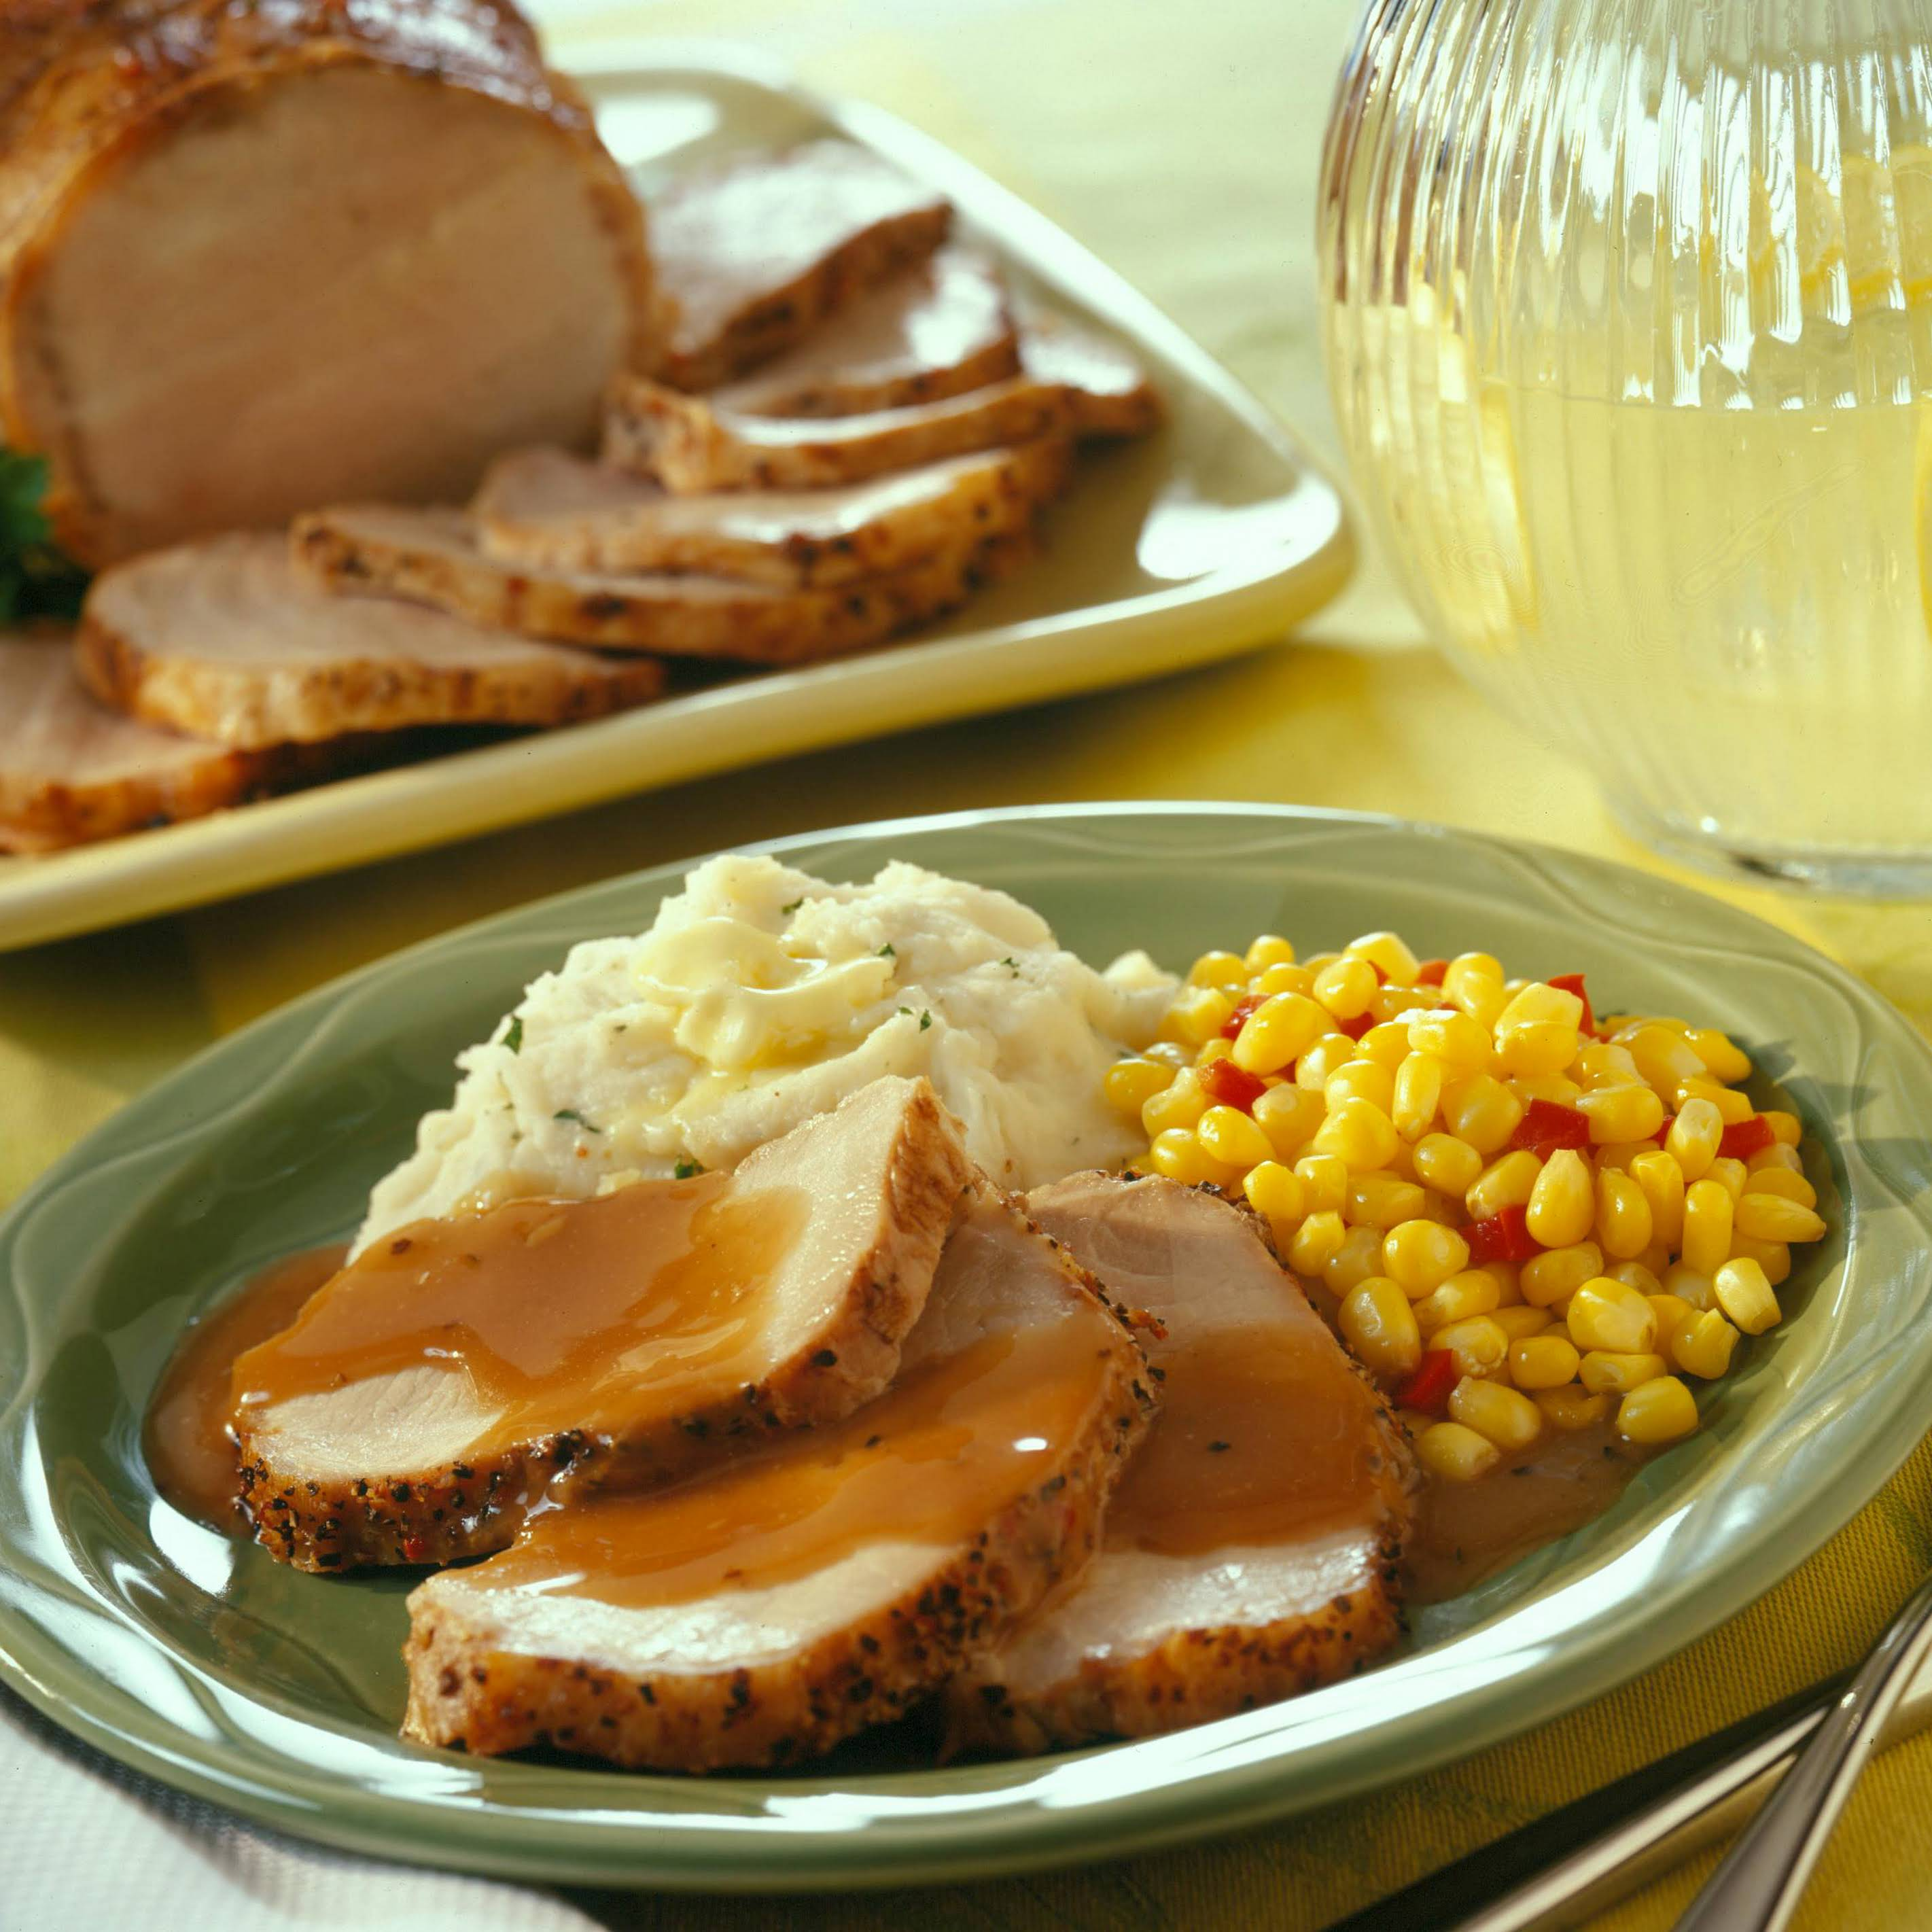 Peppered Pork Roast